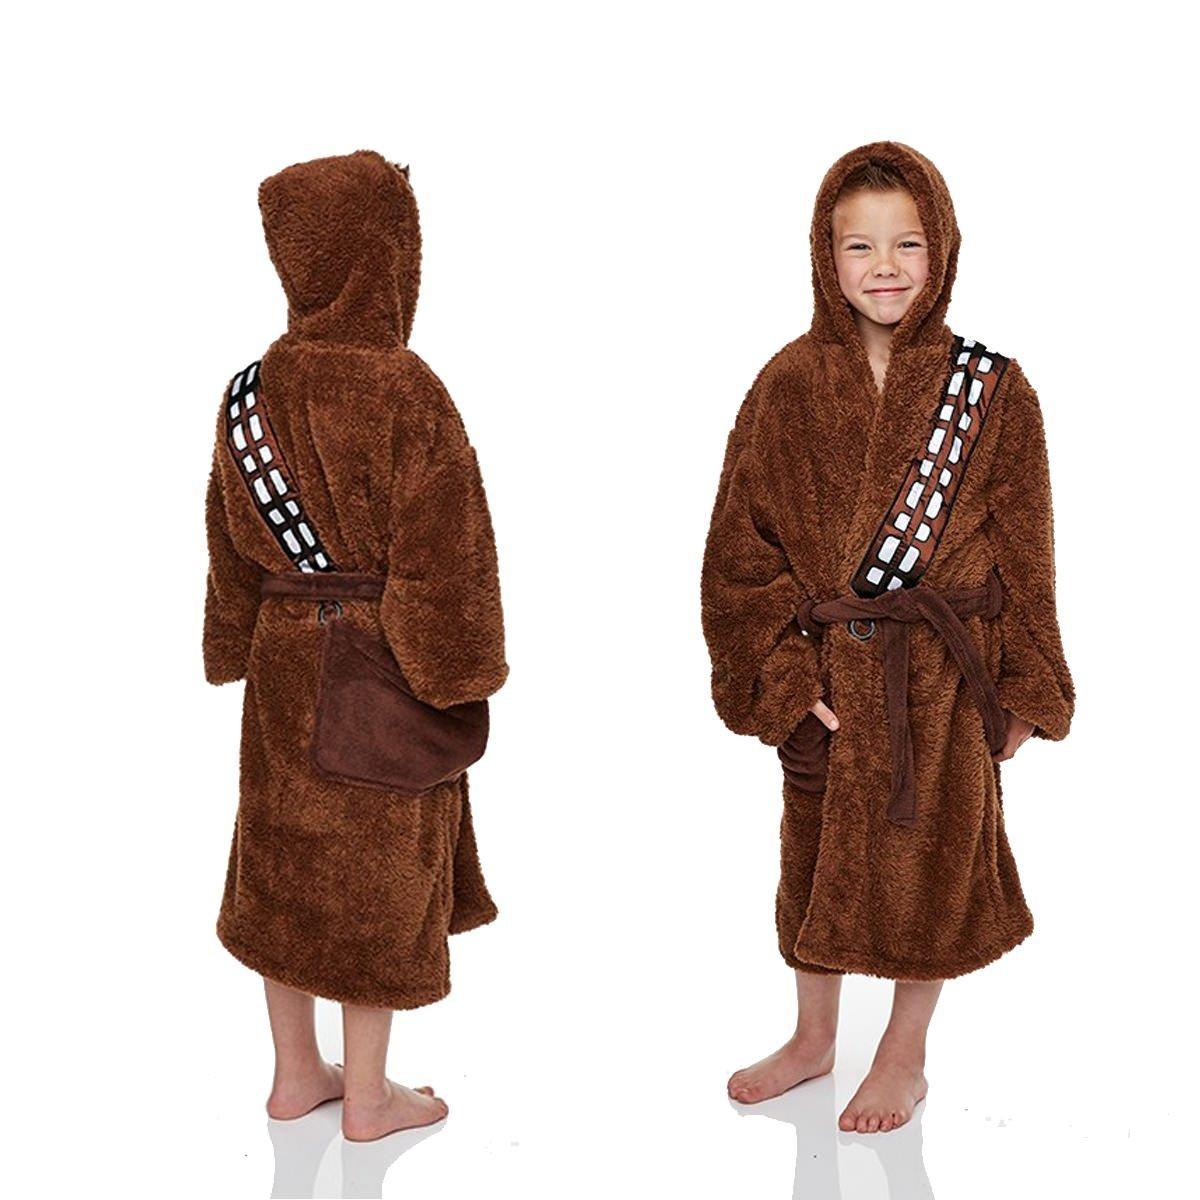 110a1035c9 Unisex Chewbacca Bathrobe Brown - Medium - 7-9 Years  Amazon.co.uk  Clothing